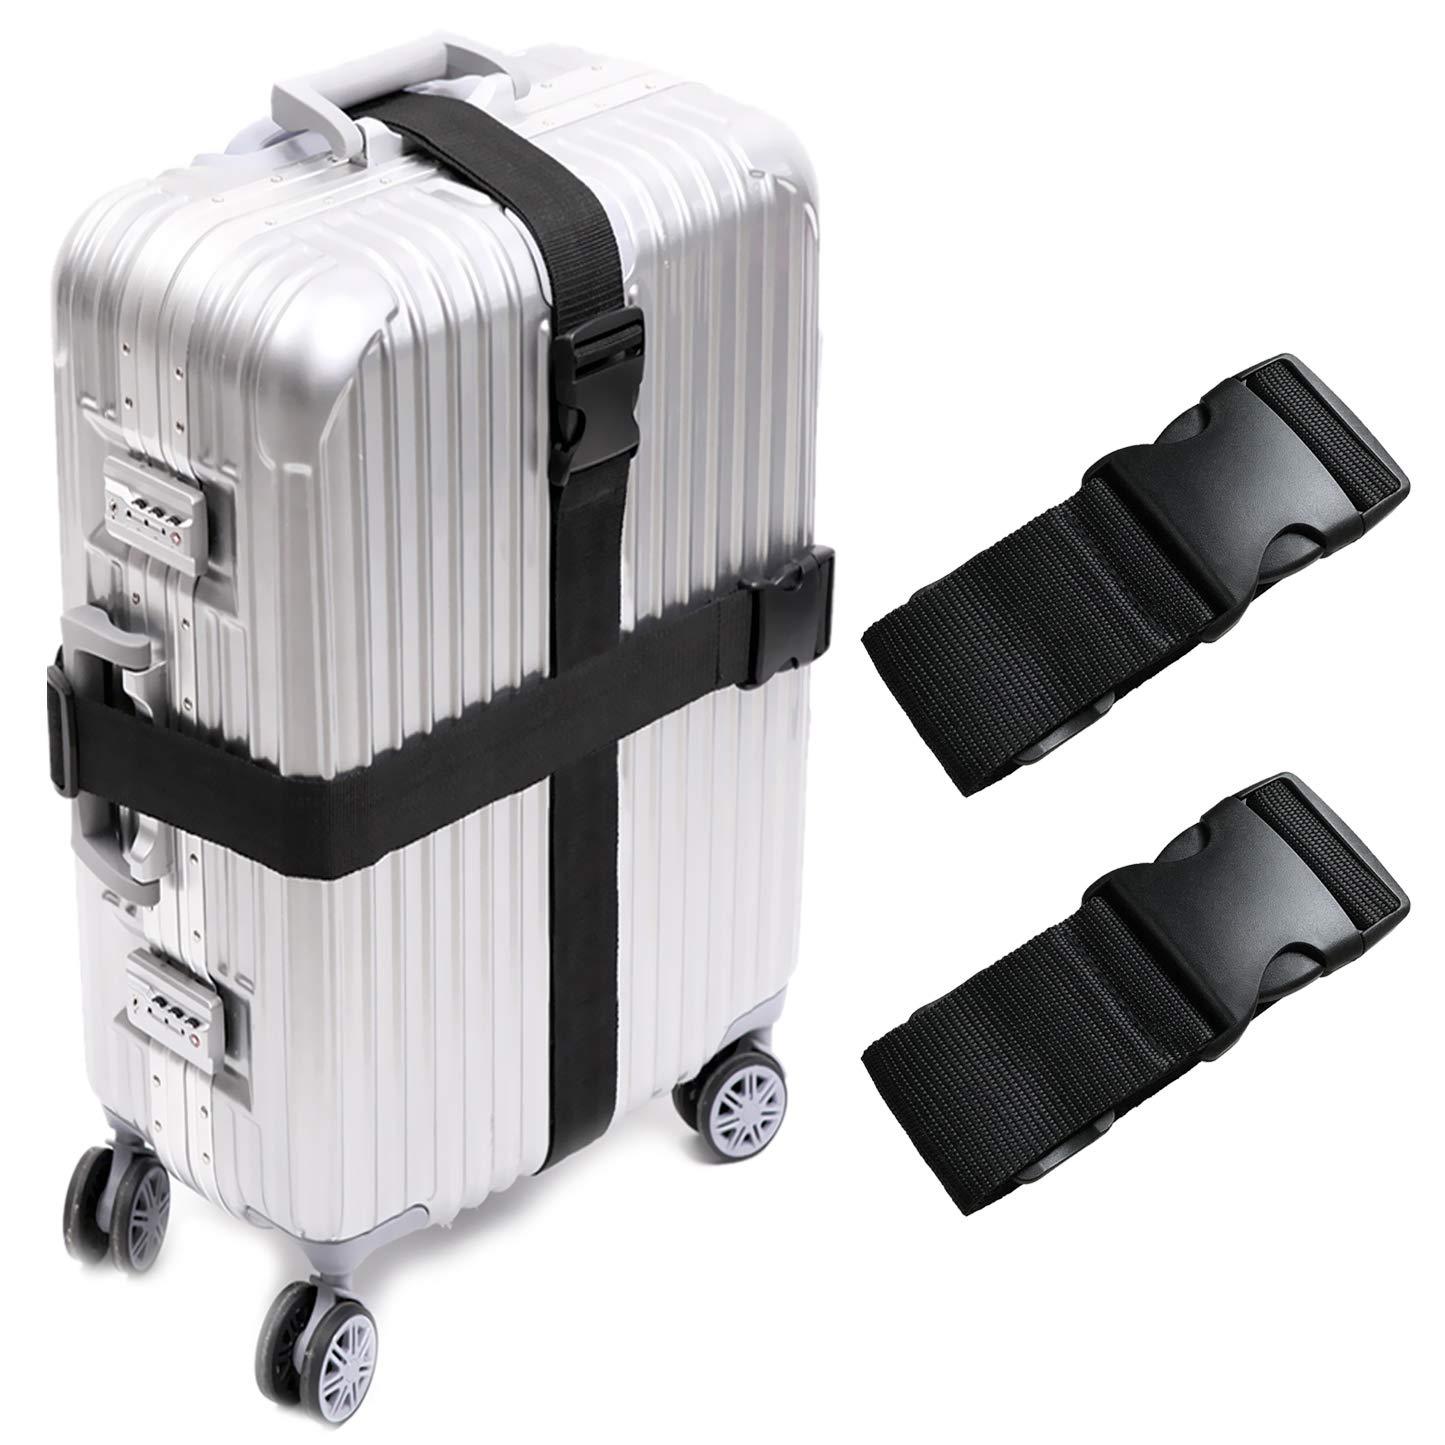 cf1a1a32cad7 Darller 2/4 PCS Luggage Straps Suitcase Belts Travel Accessories Bag Straps